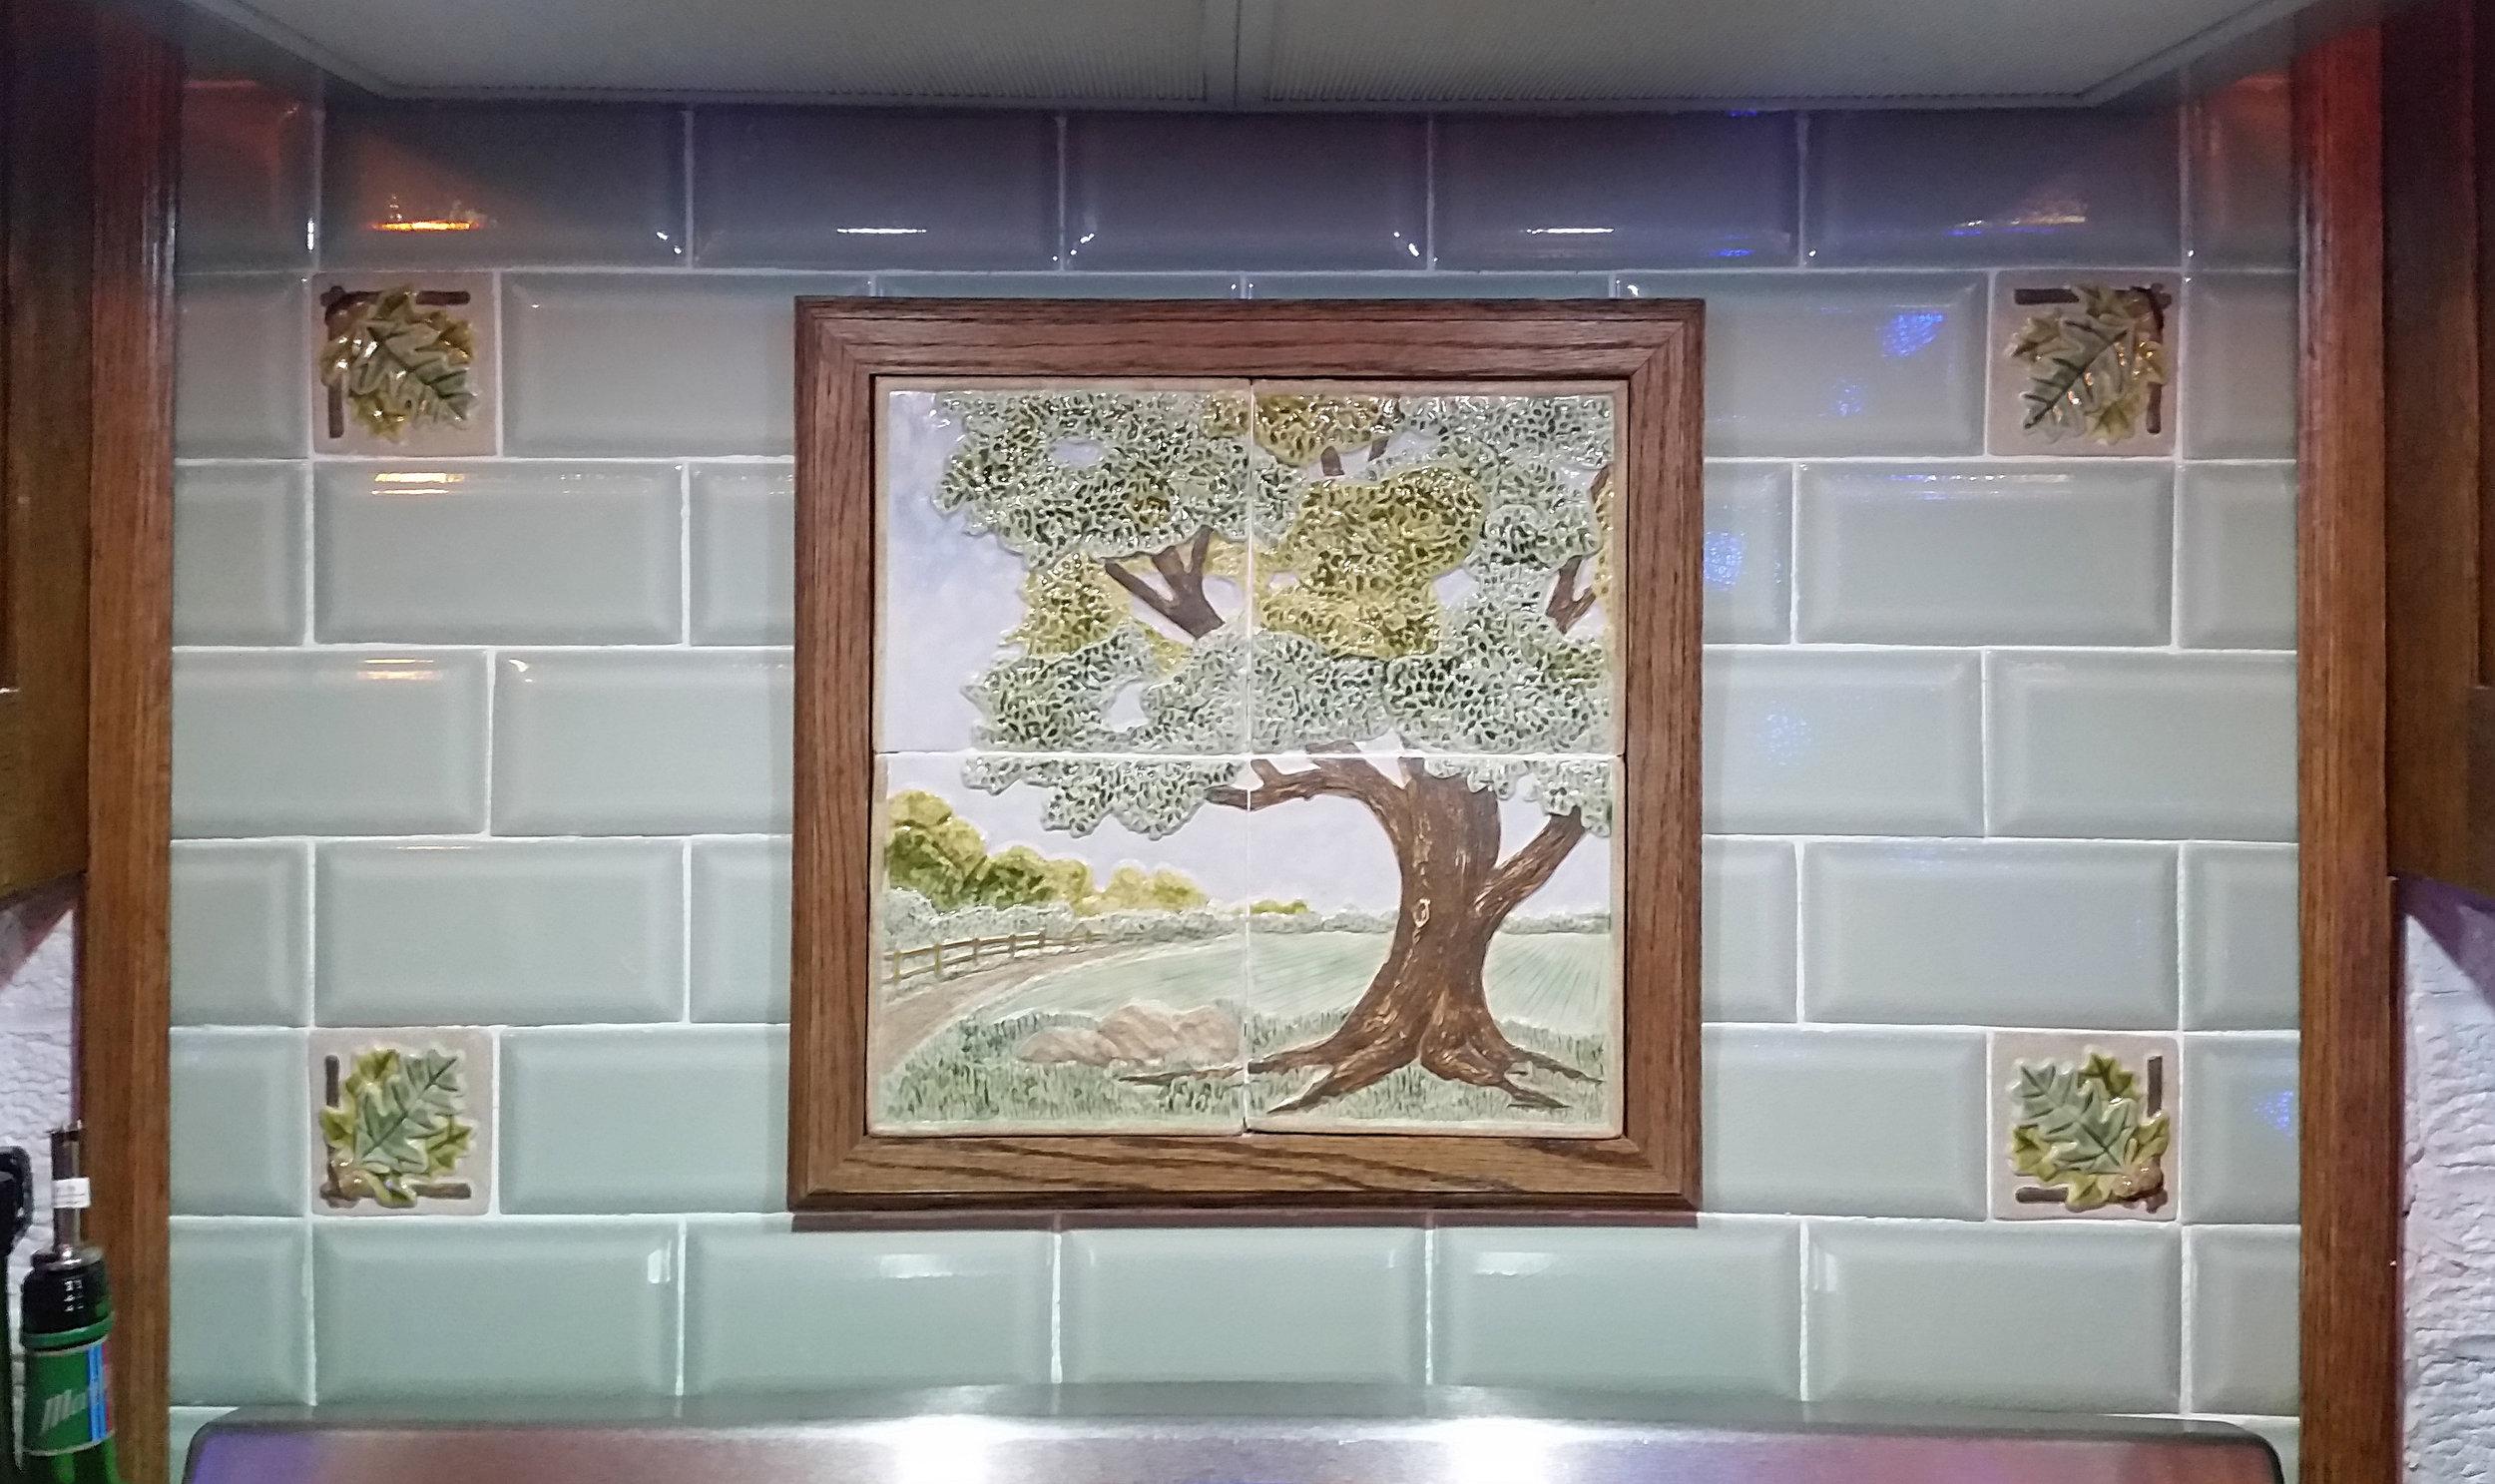 shearrow-tile-20181129_192226.jpg